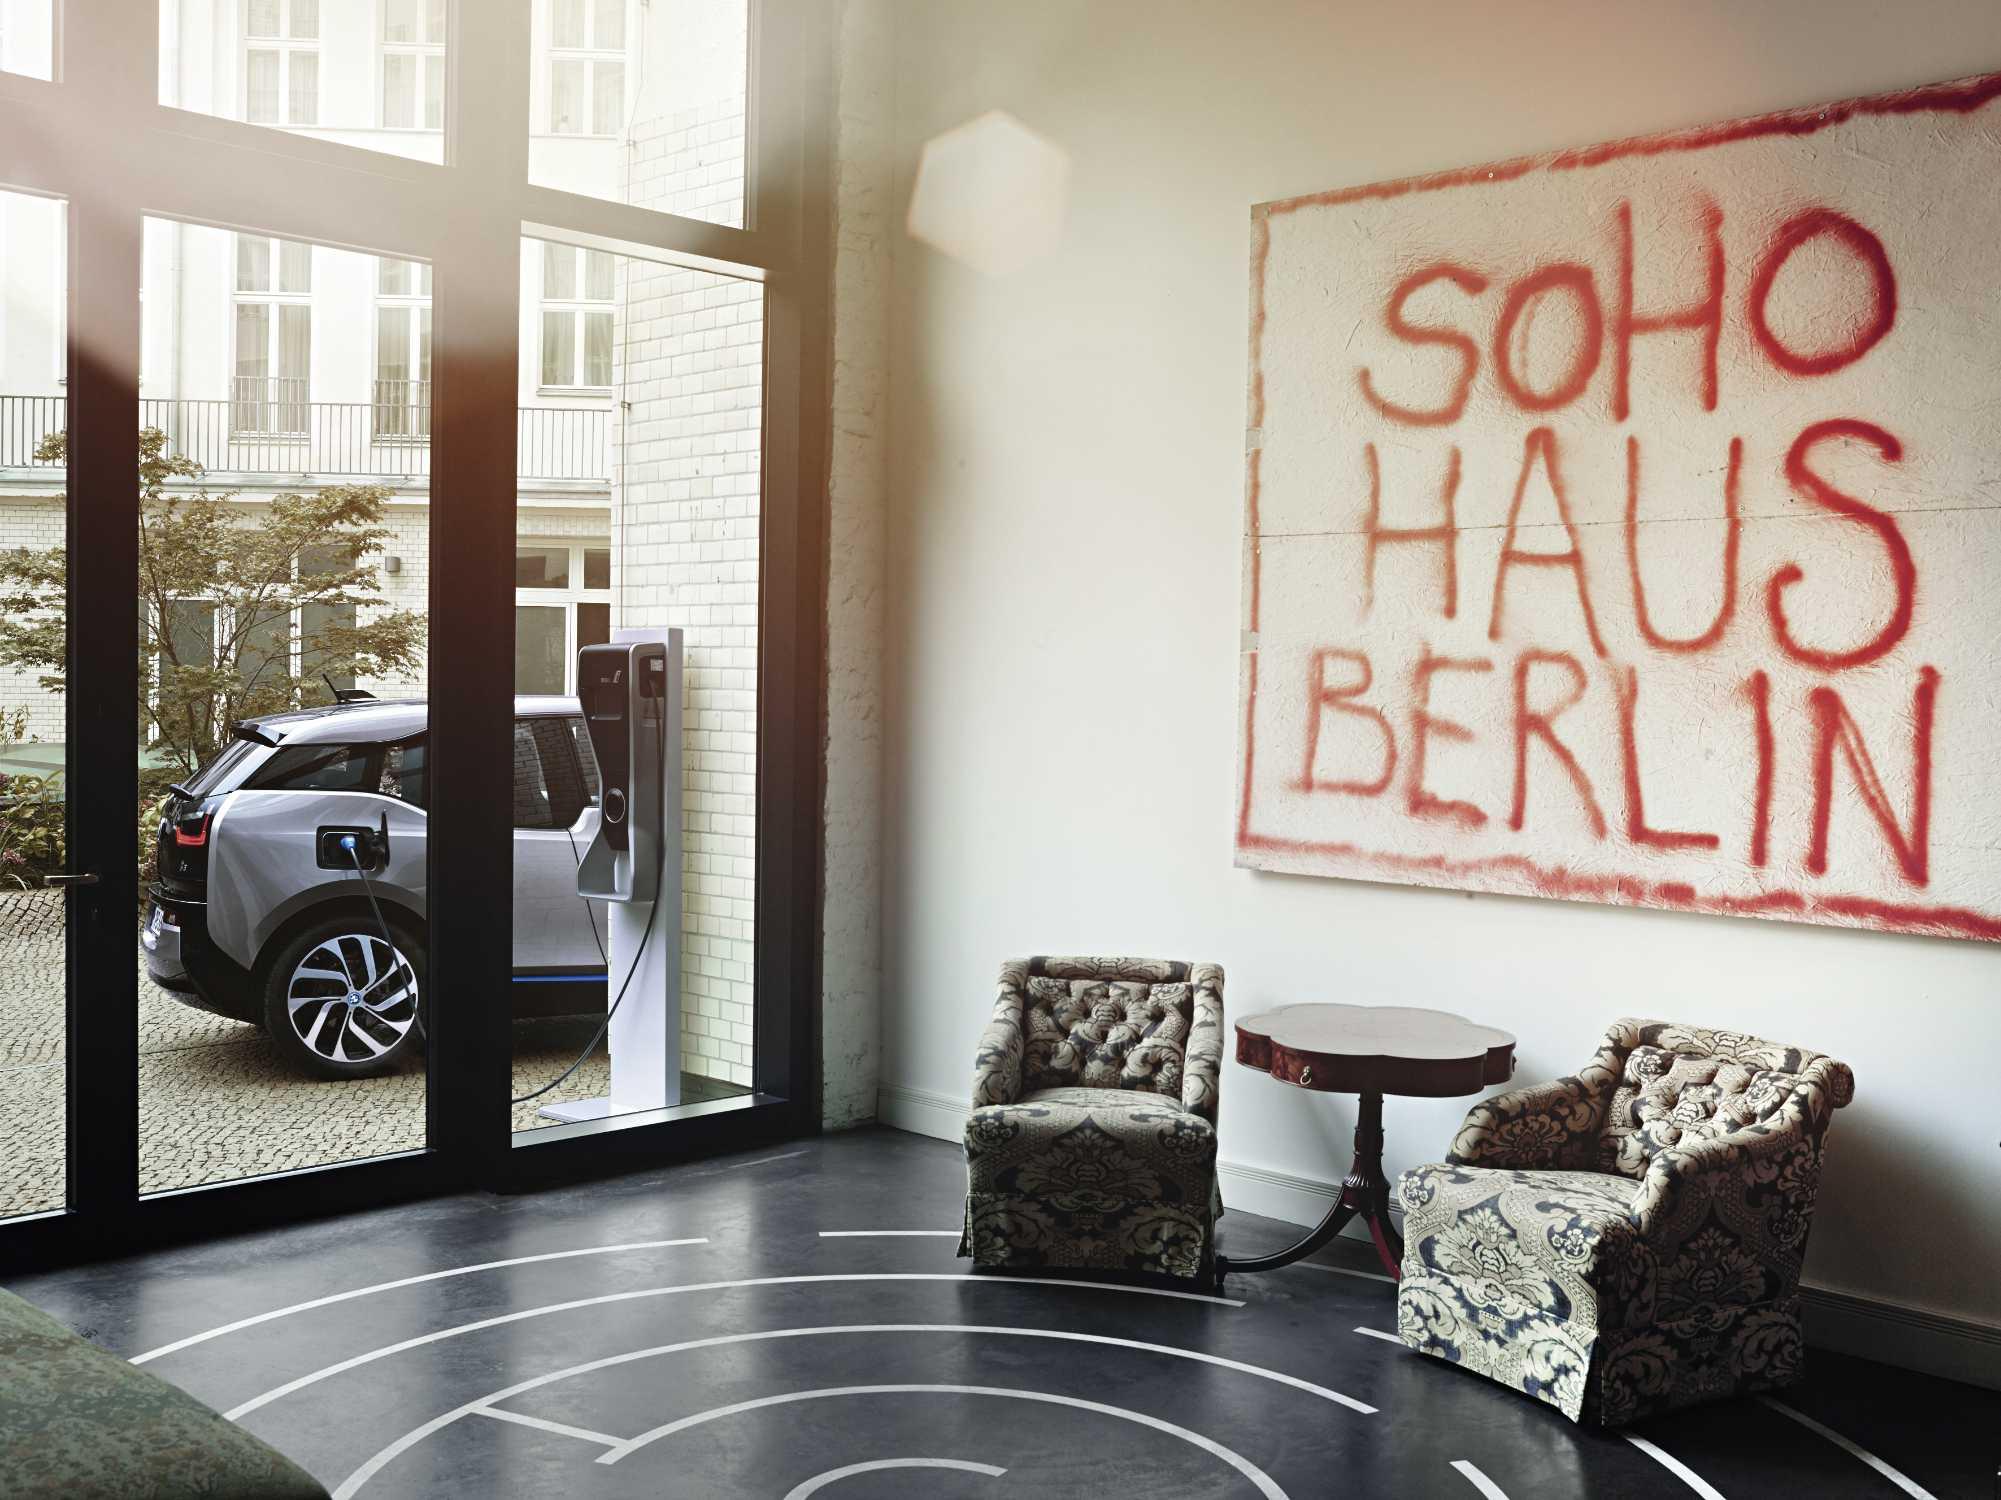 BMW I U0026 Soho House Announce Global Partnership. Exploration Of Innovation,  Arts And Design.